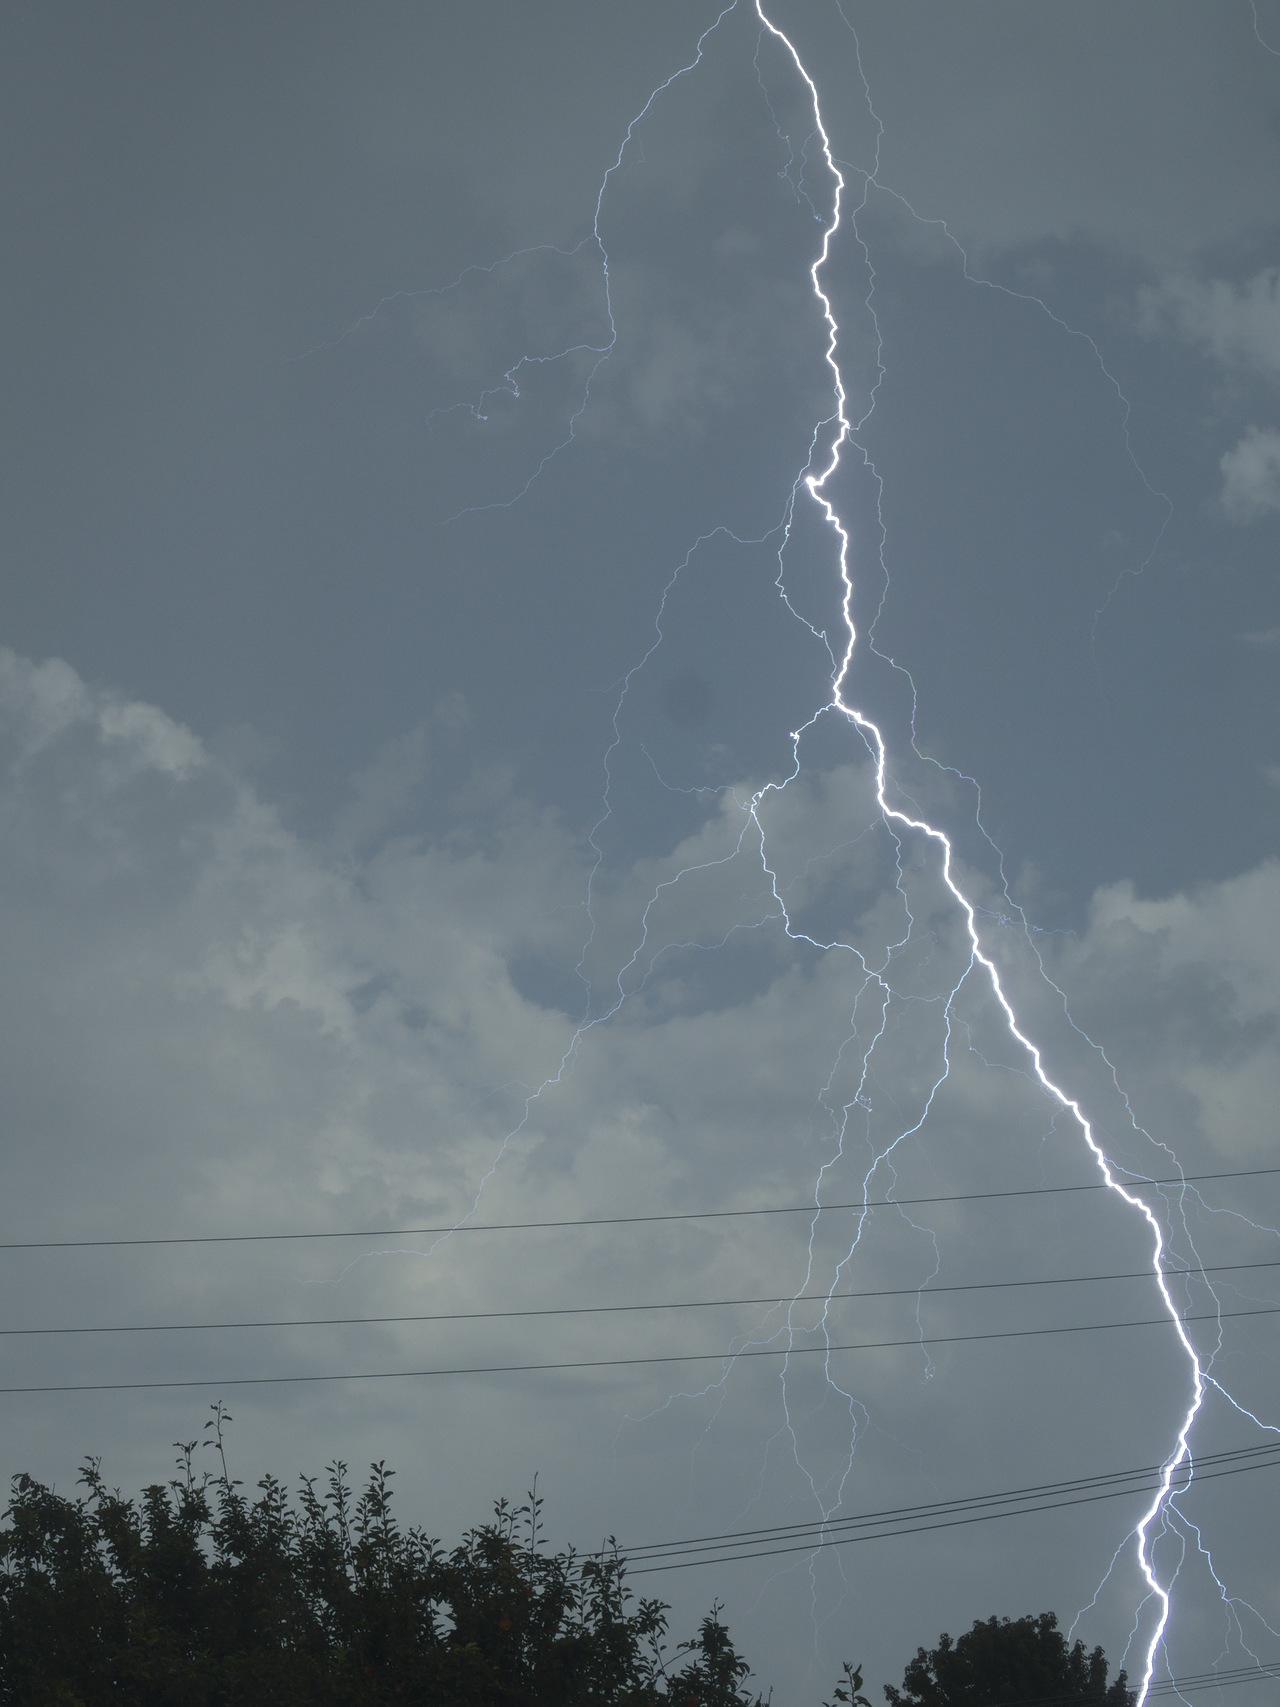 Lightning by reyalp